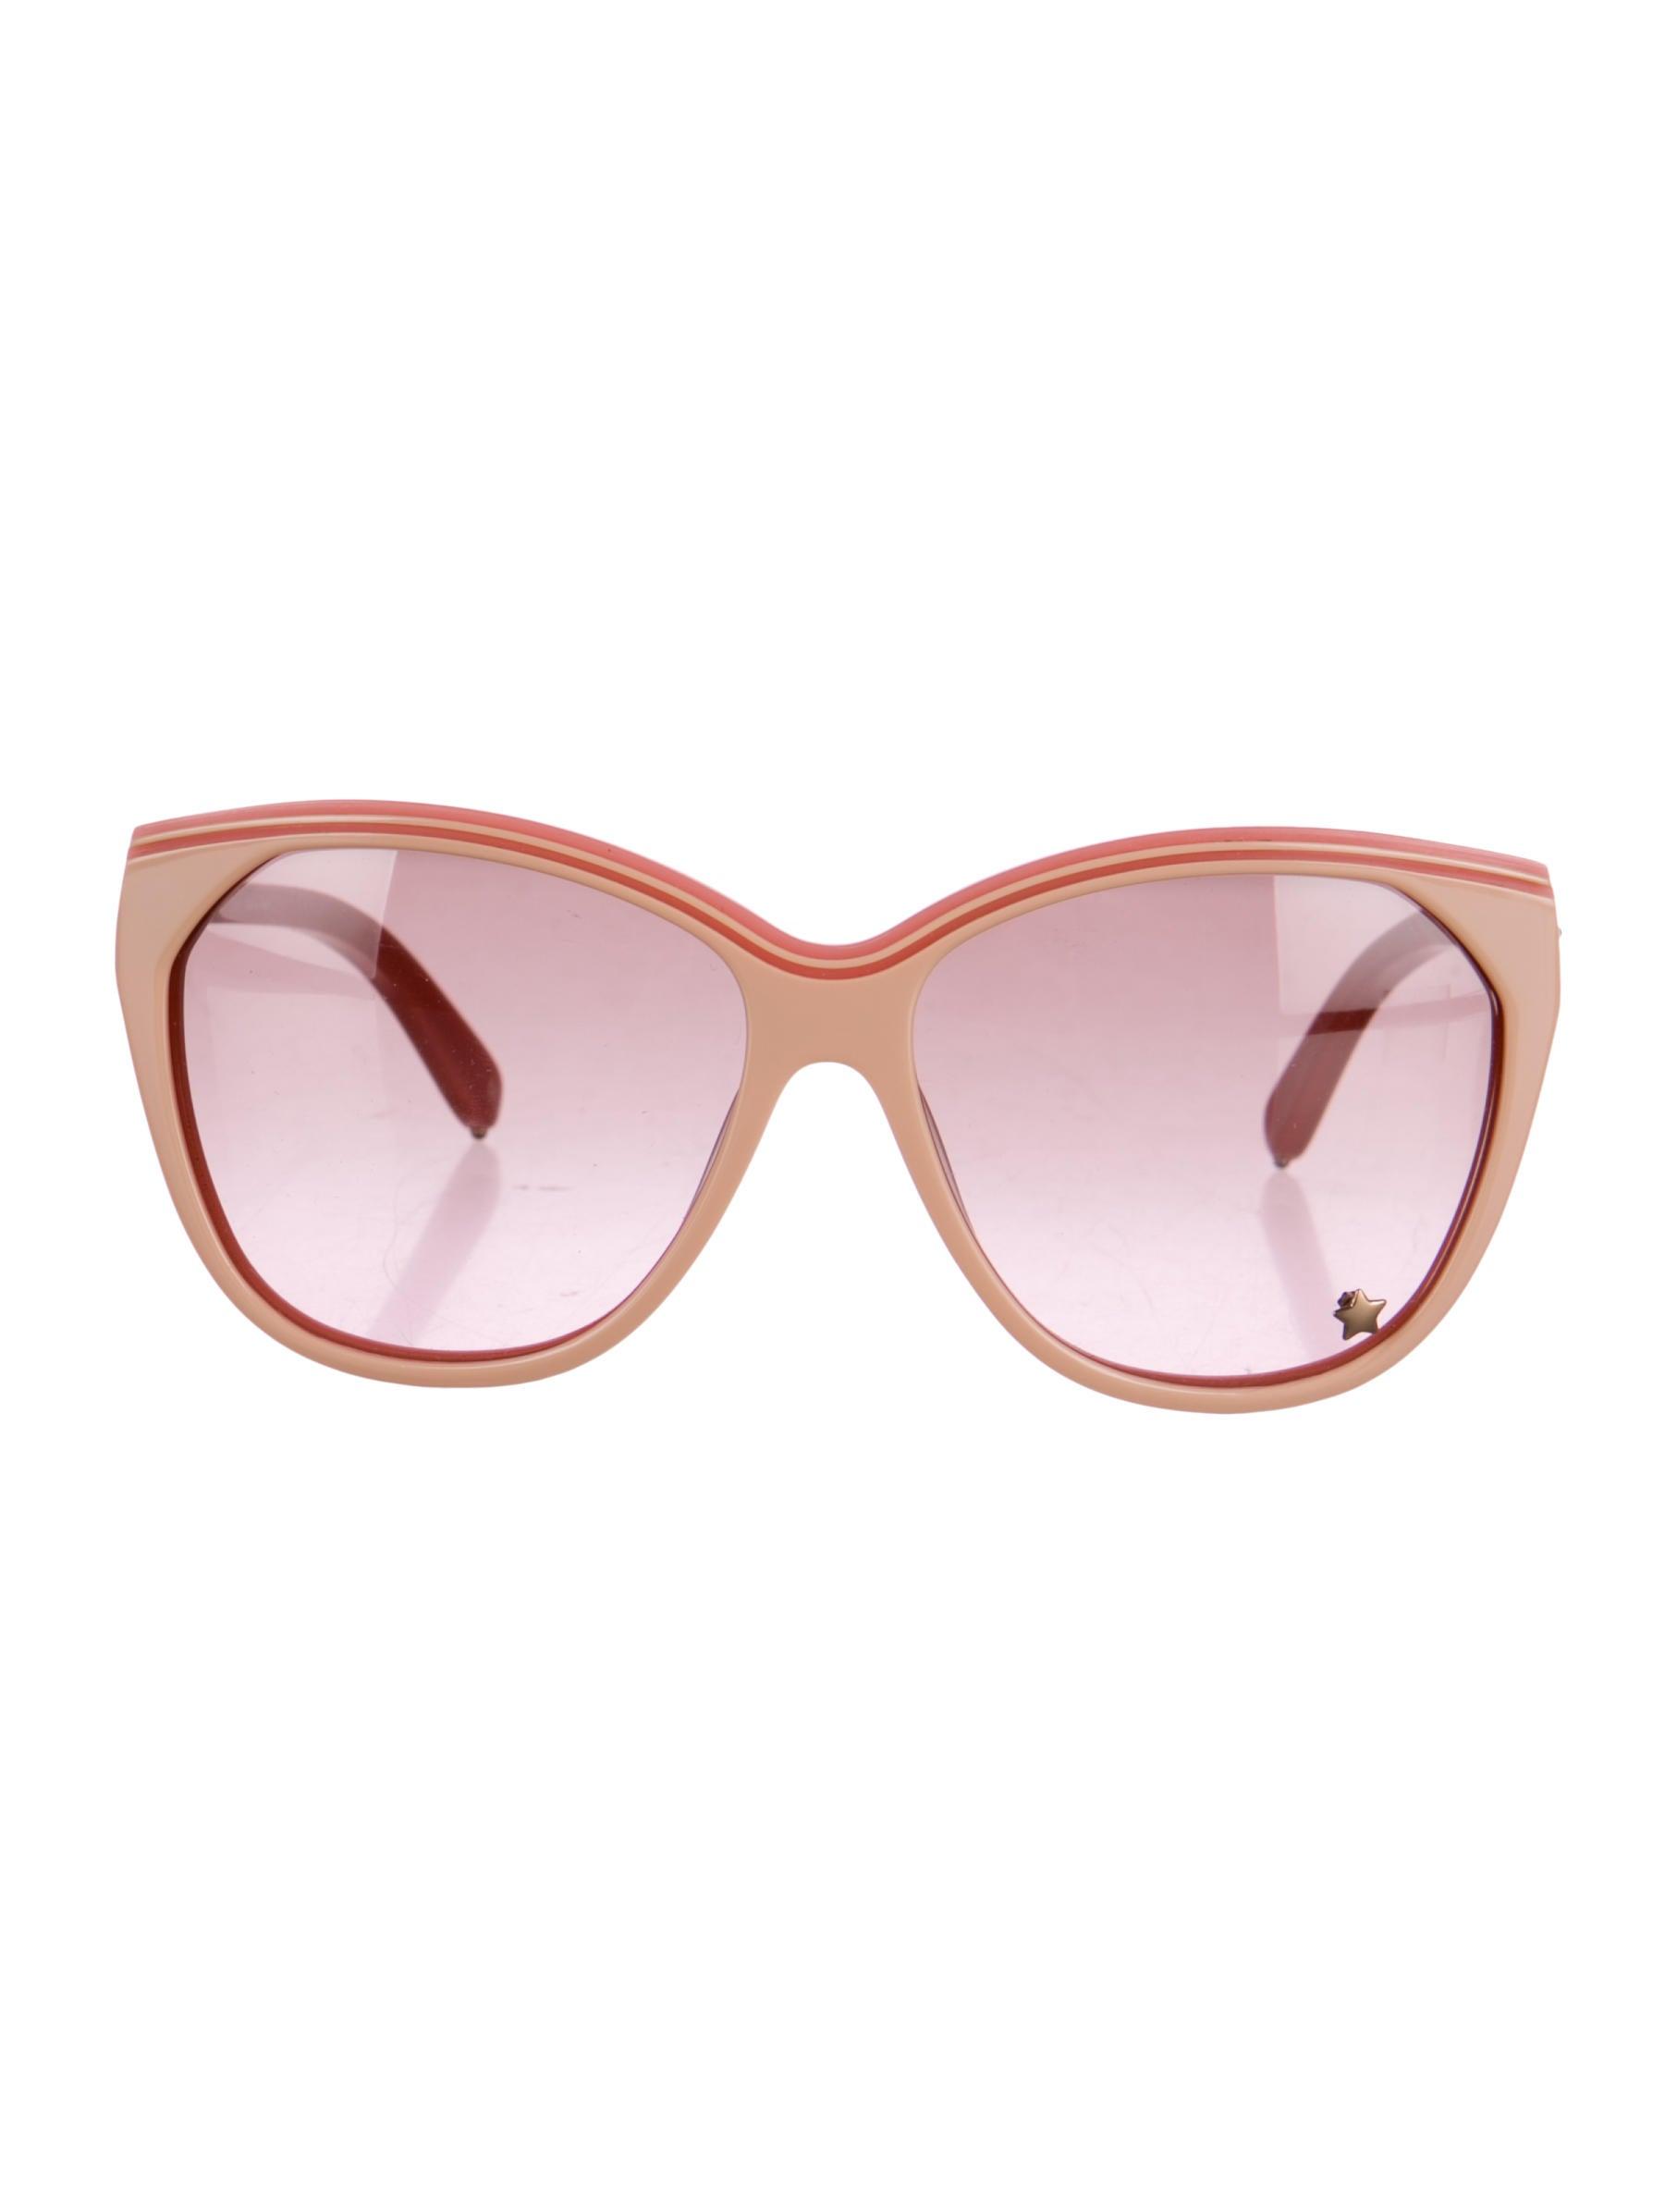 db5013bf860e Chloe sunglasses cat eye les baux de provence jpg 1814x2392 Les baux soleil chloe  eyewear